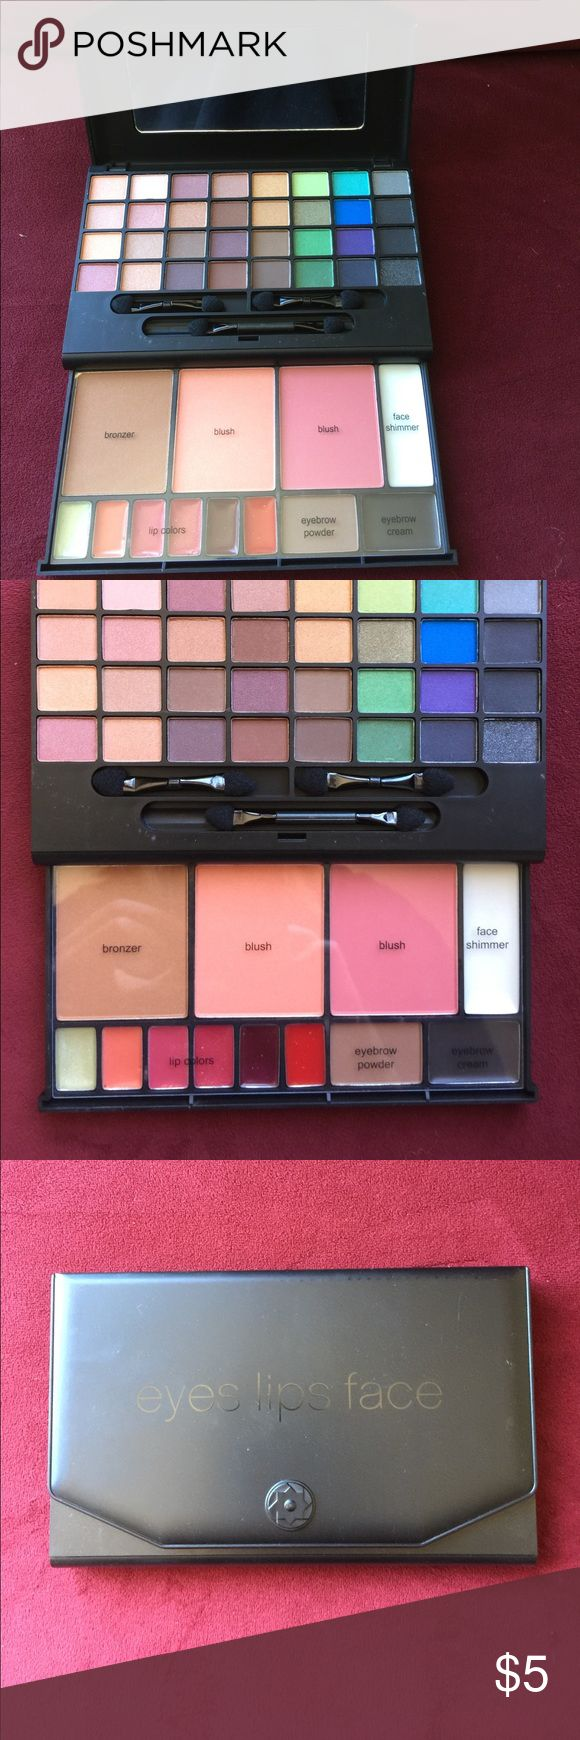 Makeup Clutch Elf Eyes, Lips and Face 47 Piece Makeup kit with mirror. Elf studio Makeup Eyeshadow